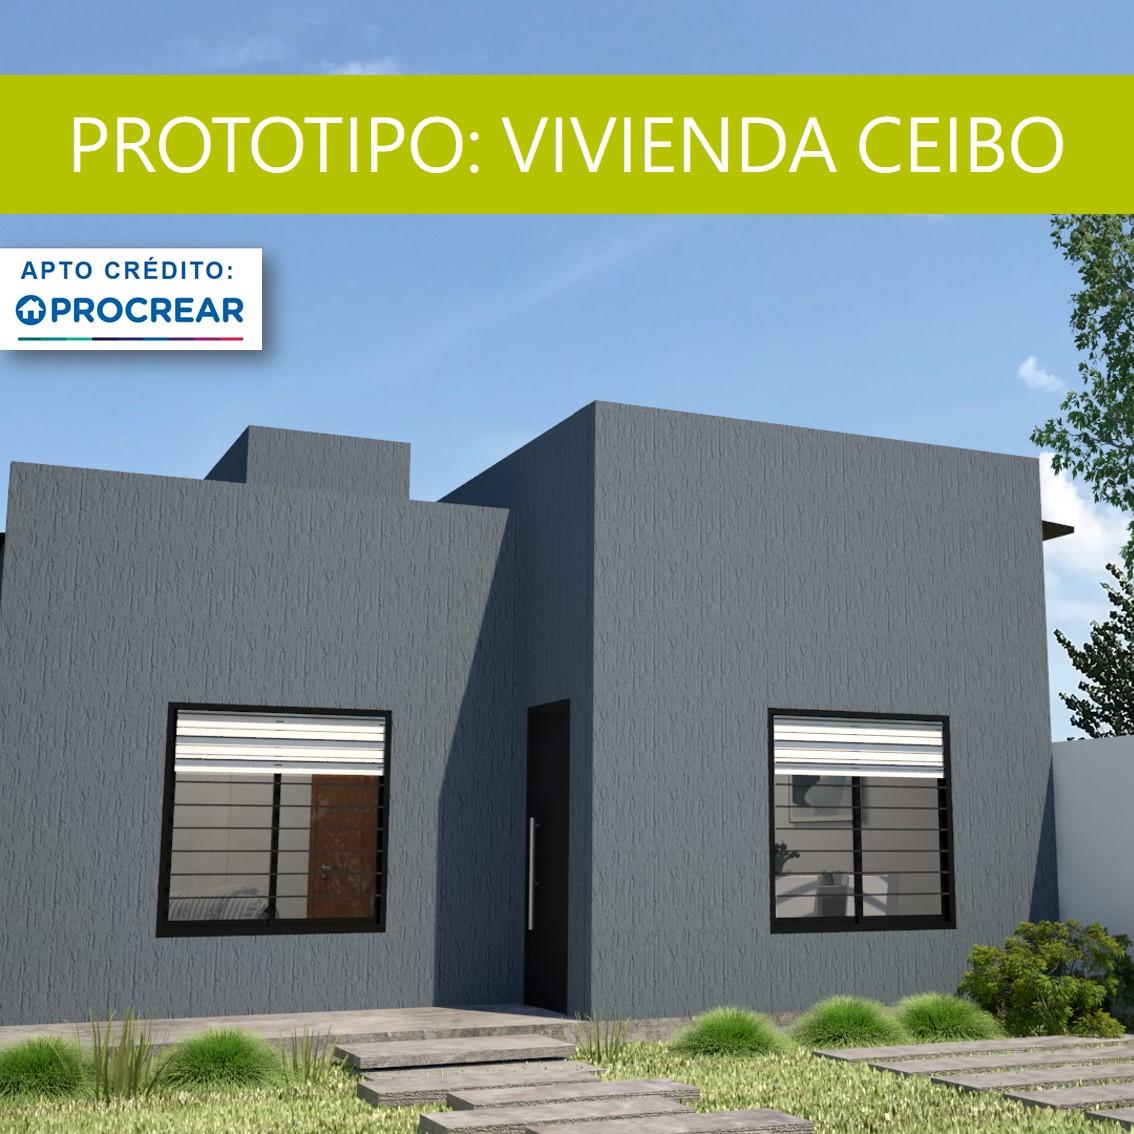 PROTOTIPO DE VIVIENDA EN STEEL FRAMING: CEIBO (social)